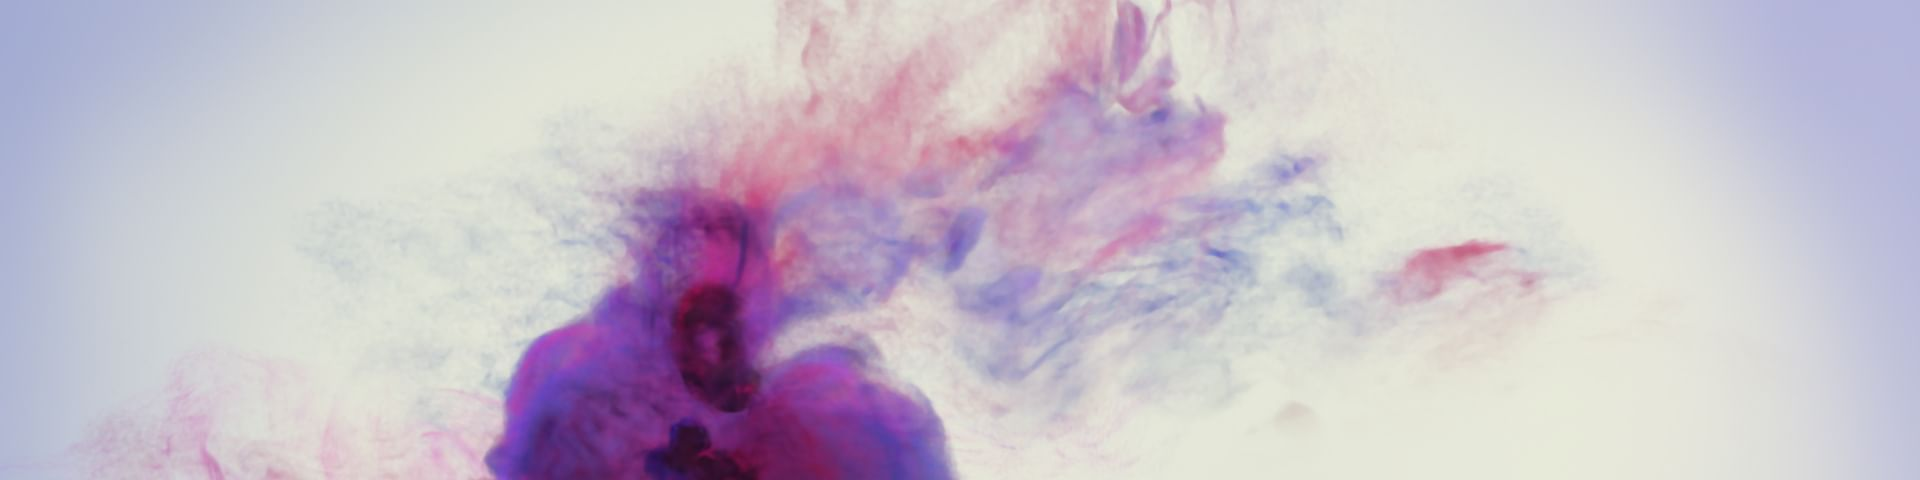 Larry Carlton & le Big Band du SWR